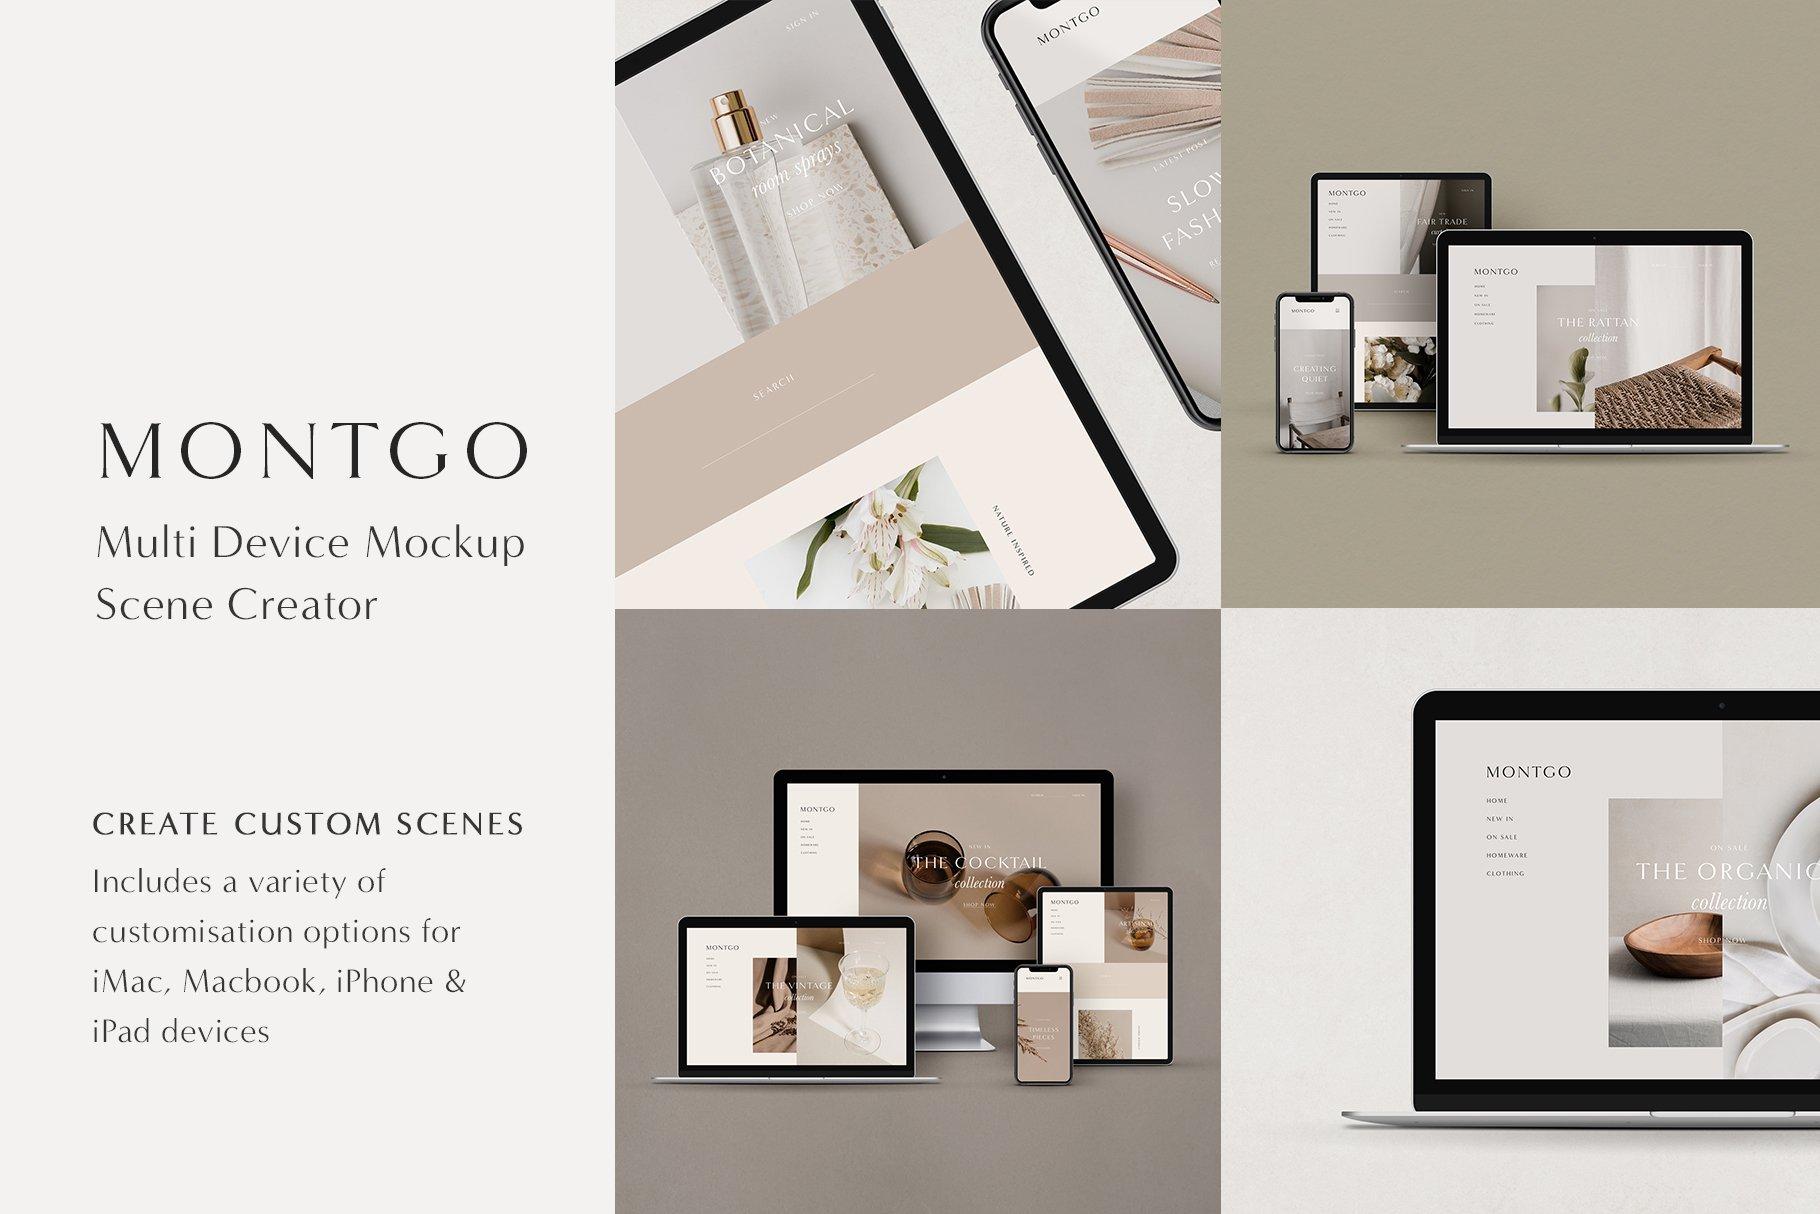 MOYO - Multi Device Mockup Scene Creator